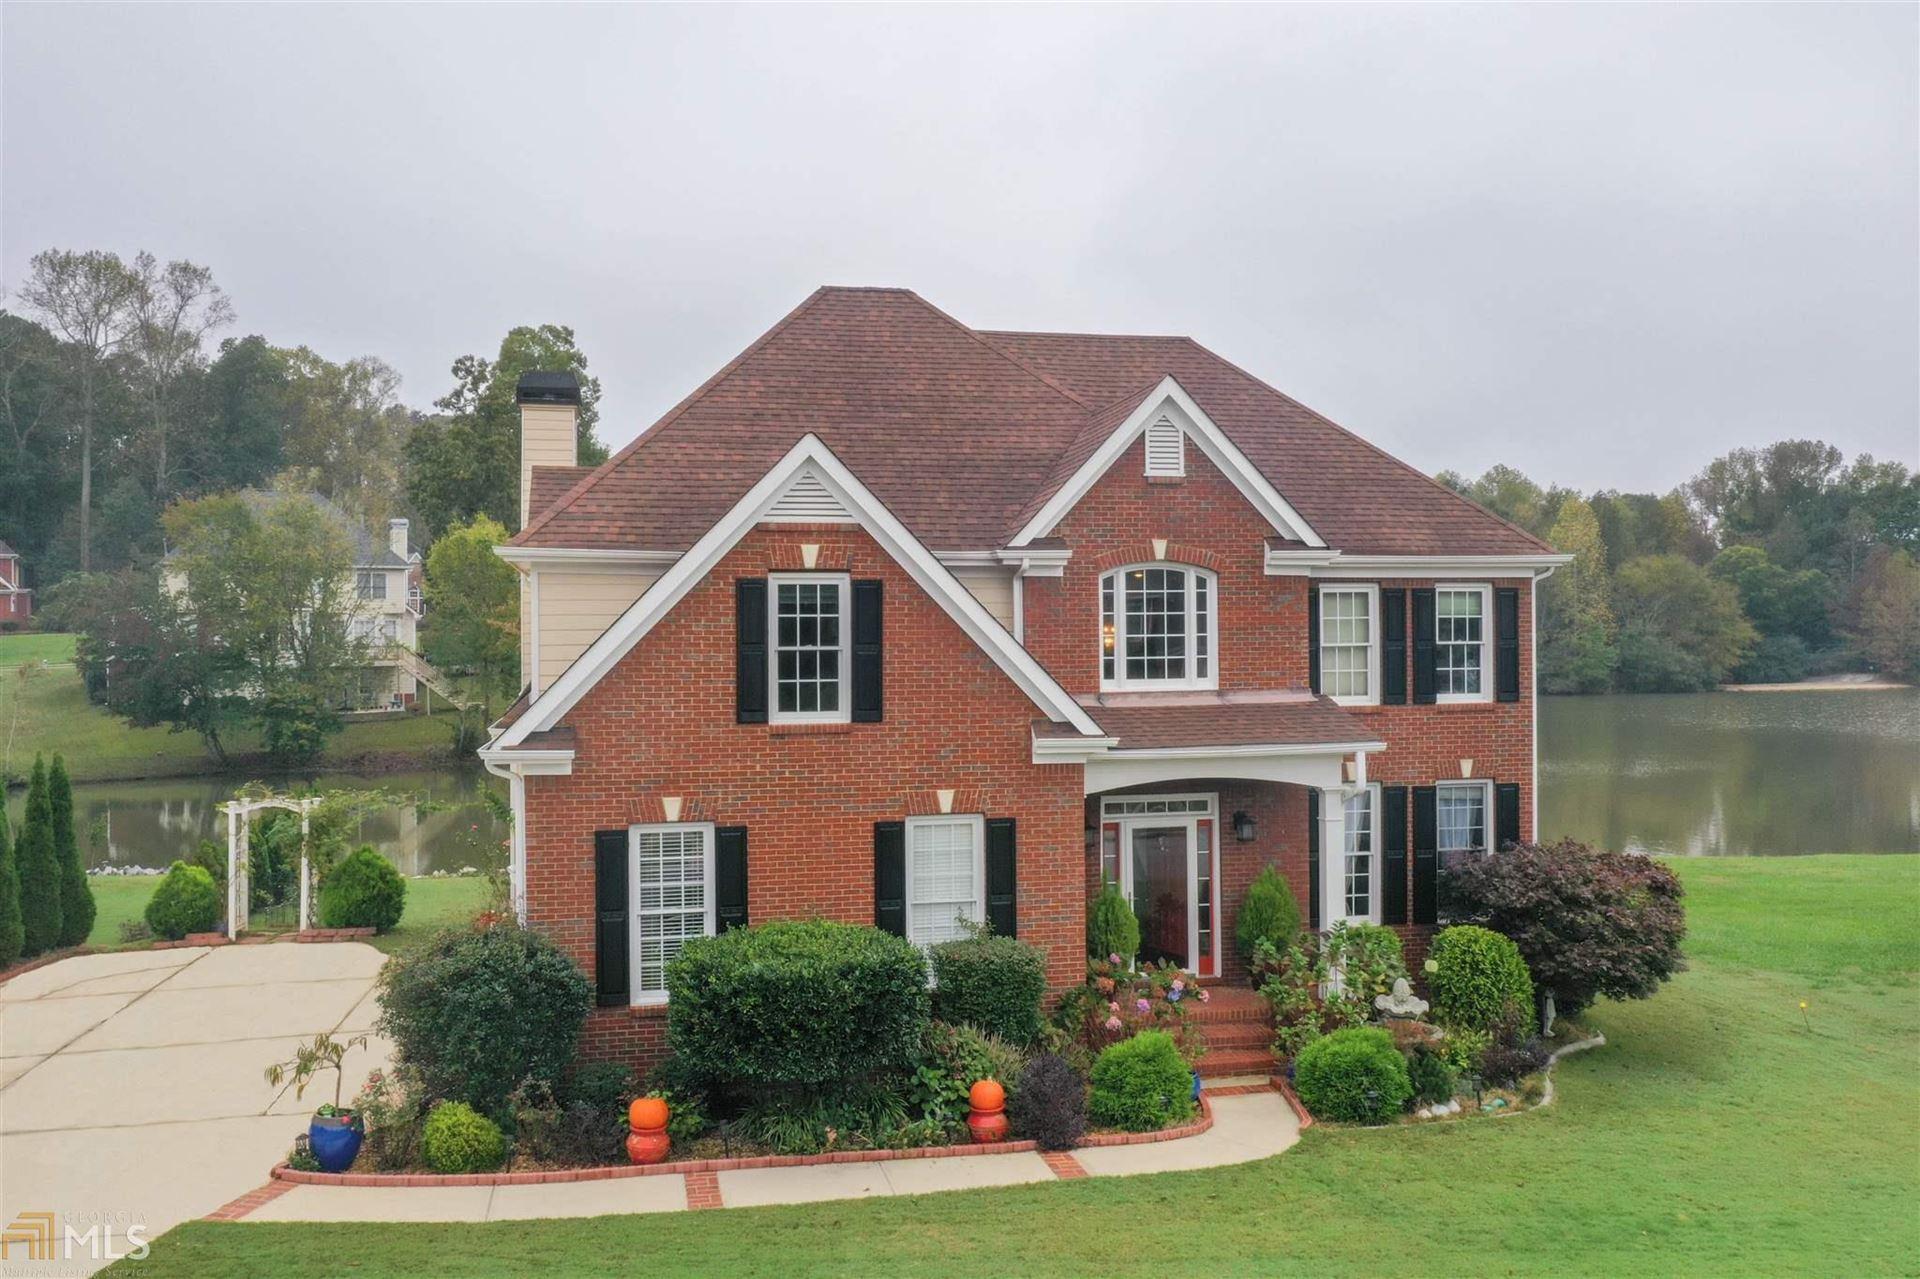 265 Heritage Lake Dr, Fayetteville, GA 30214 - MLS#: 8879523